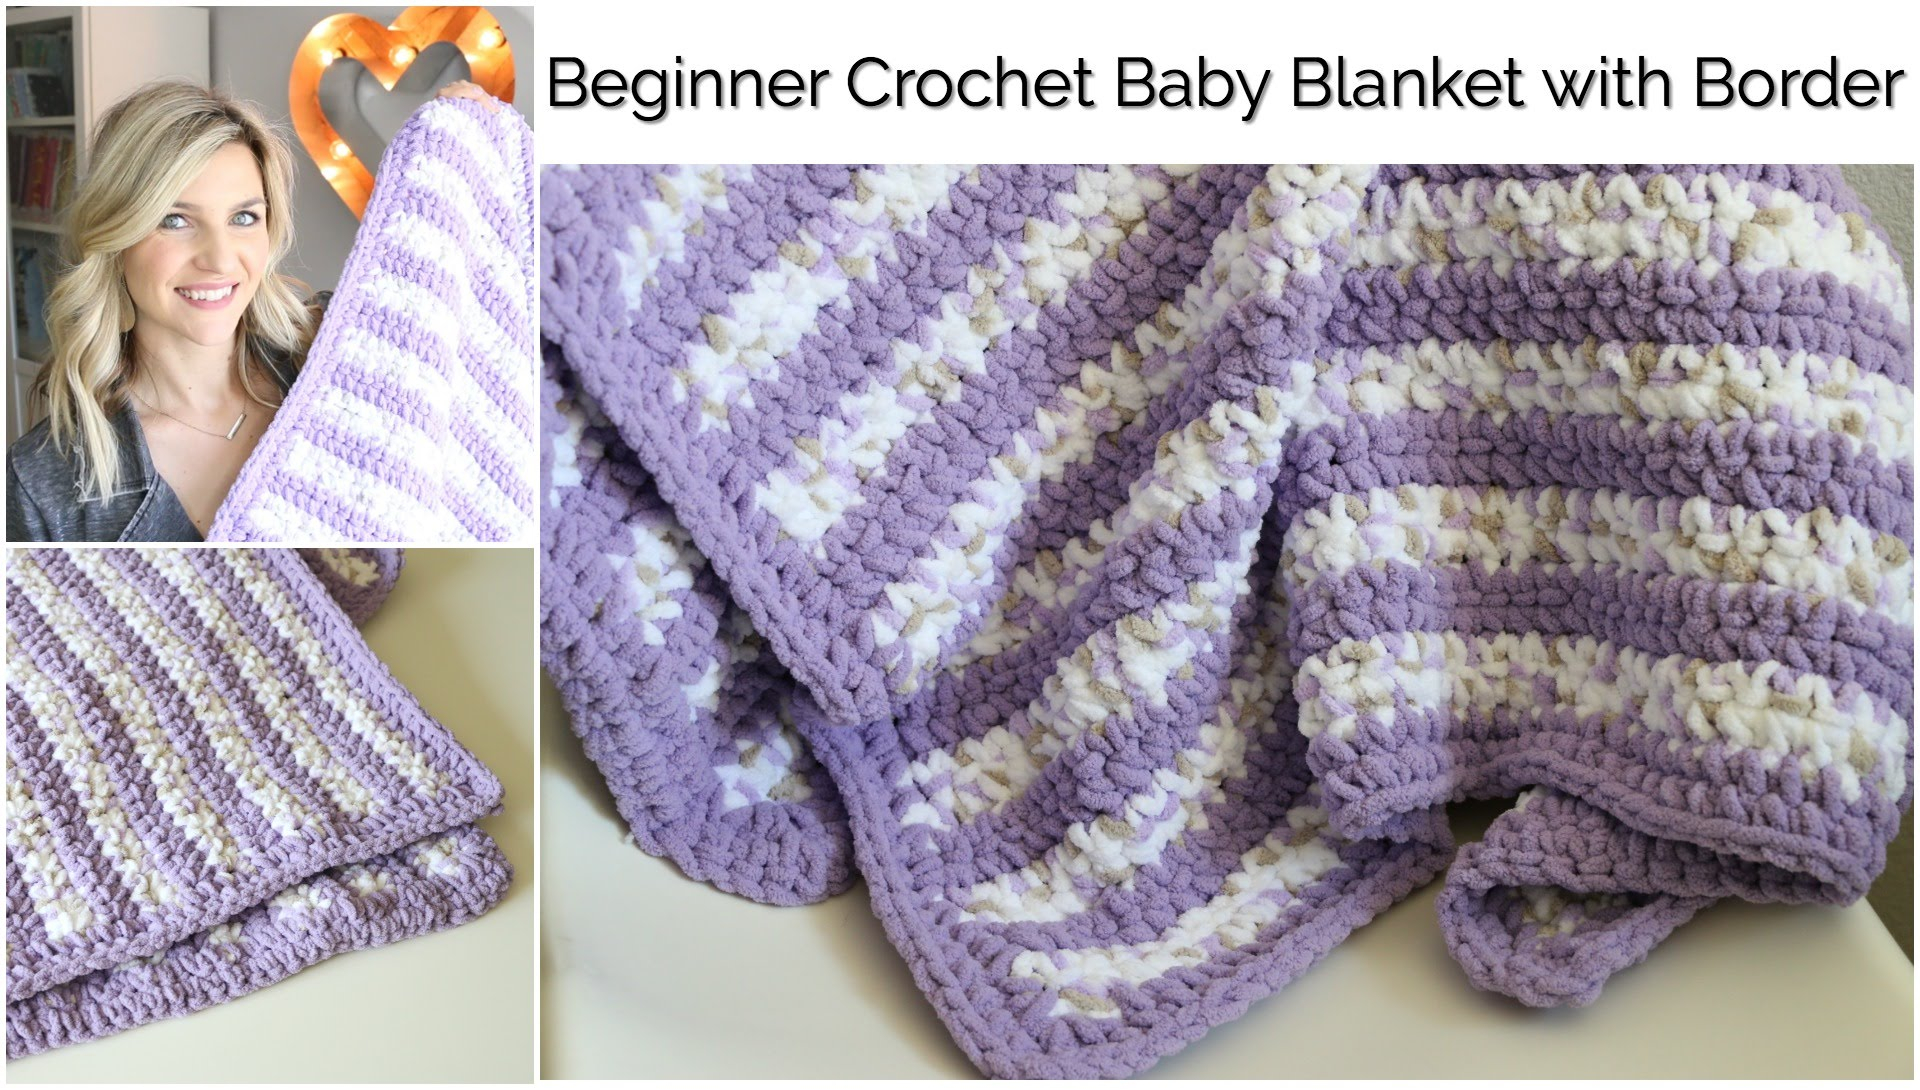 Begginer Crochet Projects Baby Blankets Beginner Crochet Ba Stripes Blanket With Borderba Series Youtube